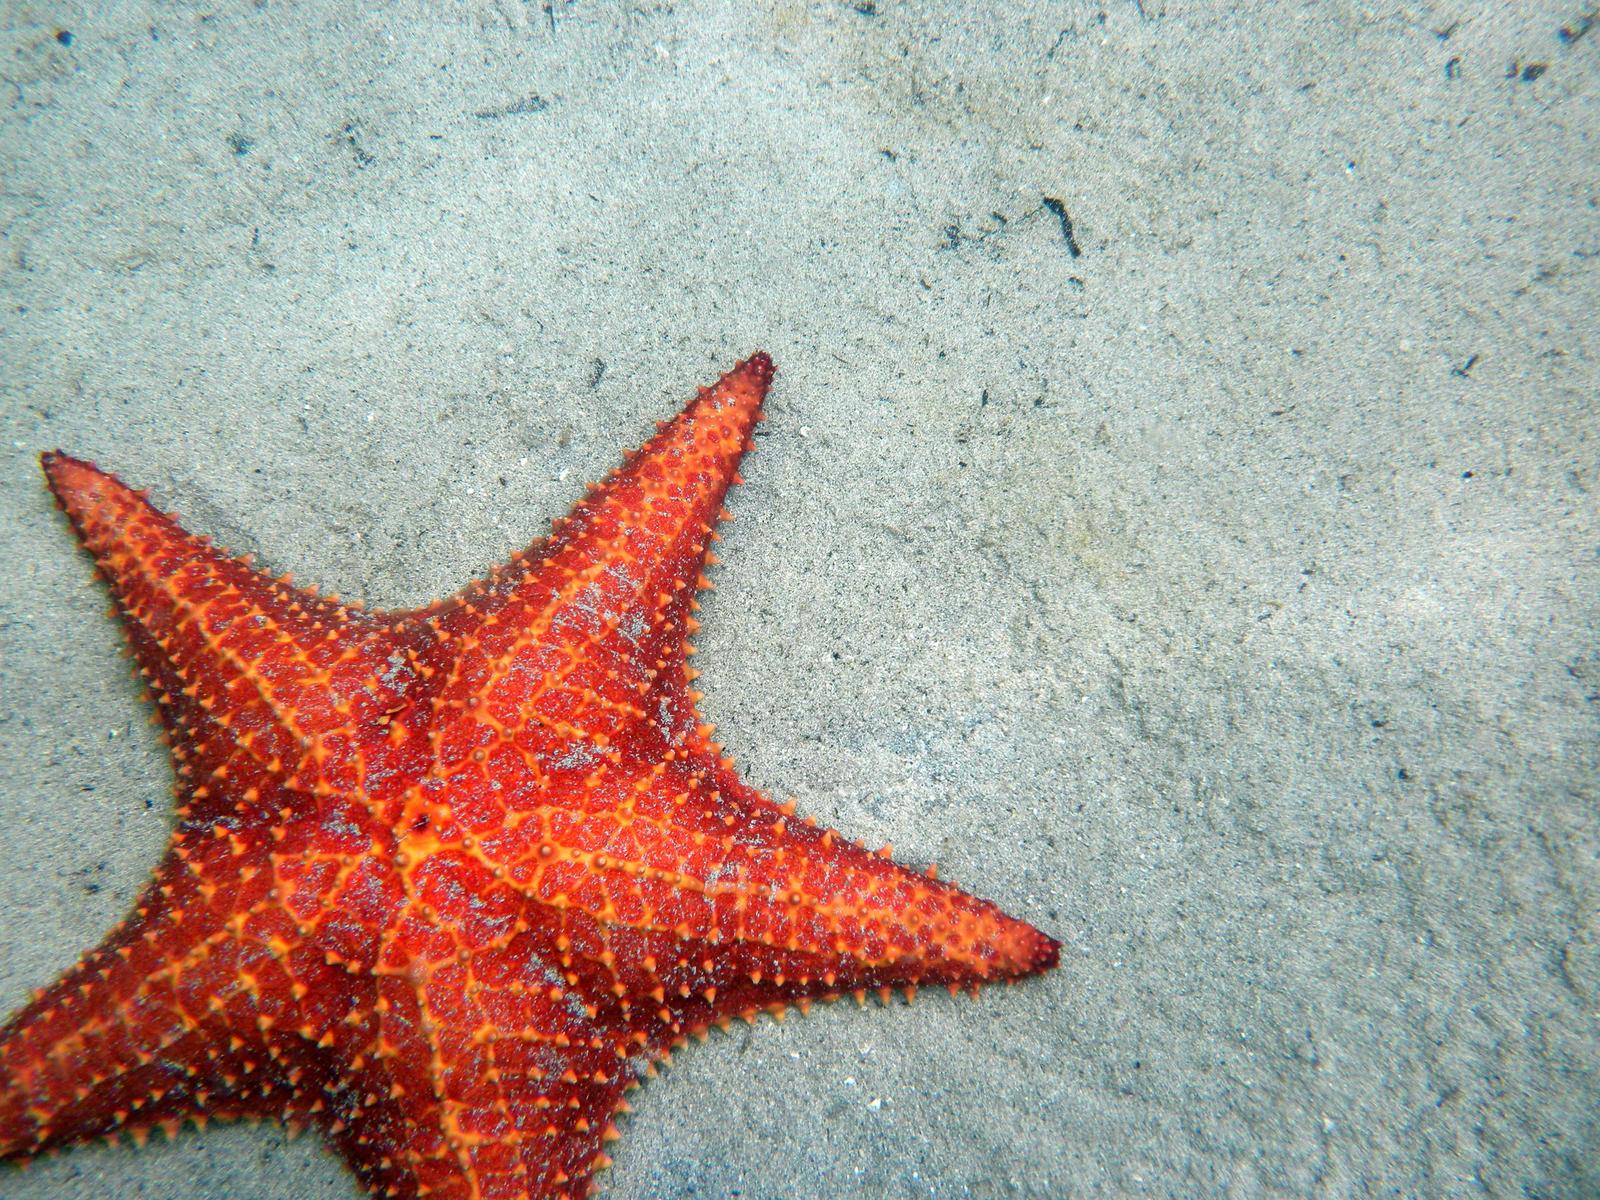 Starfish - The Animal Kingdom